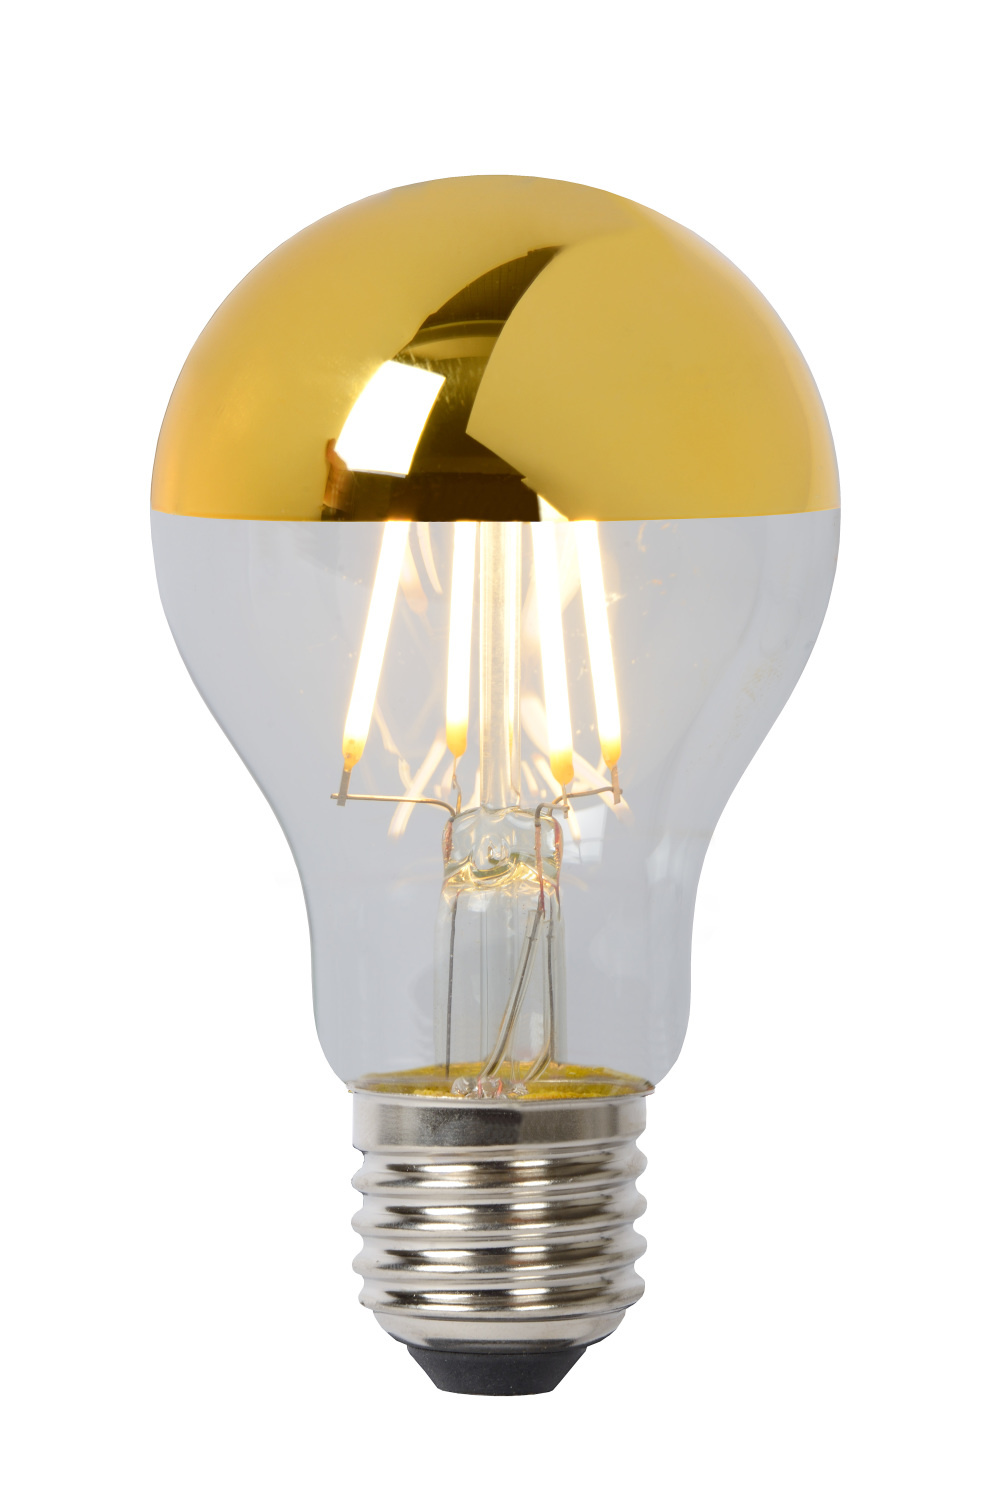 Lucide LAMP LED A60 Filament E27/5W 2700K Gold reflecto